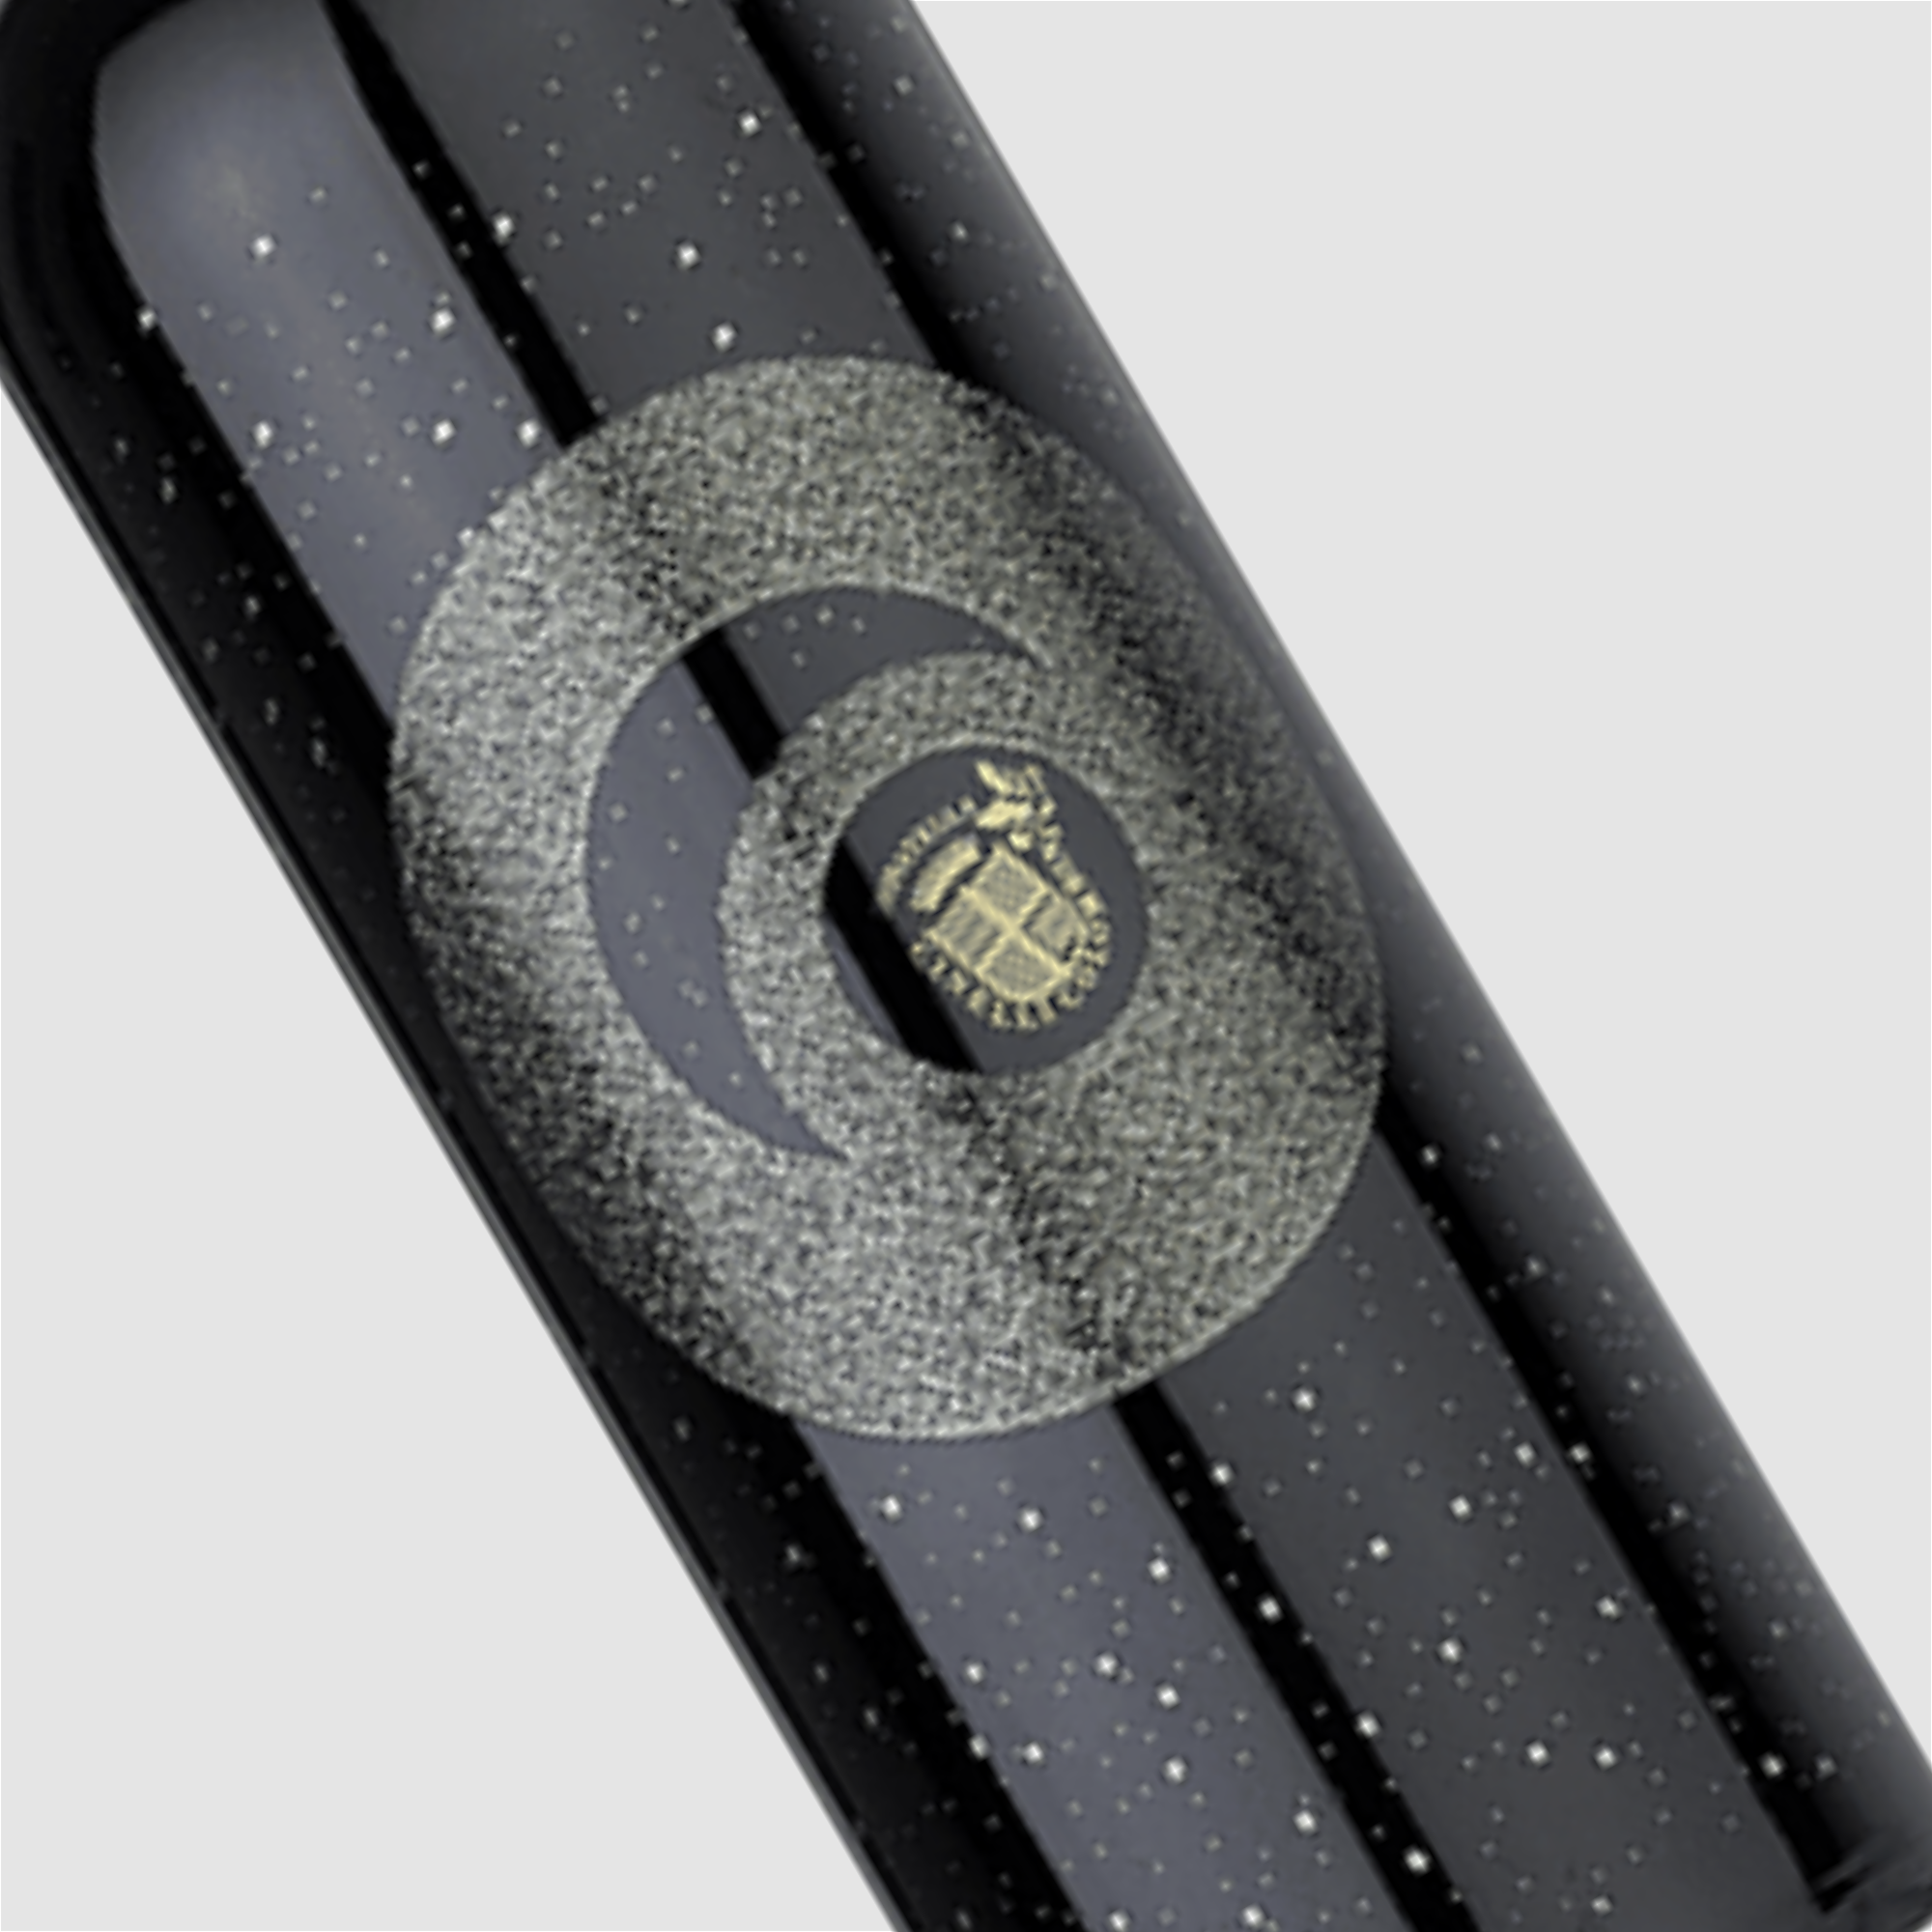 IOsonoDonatella is the first Italian wine in Alti Wine Exchange